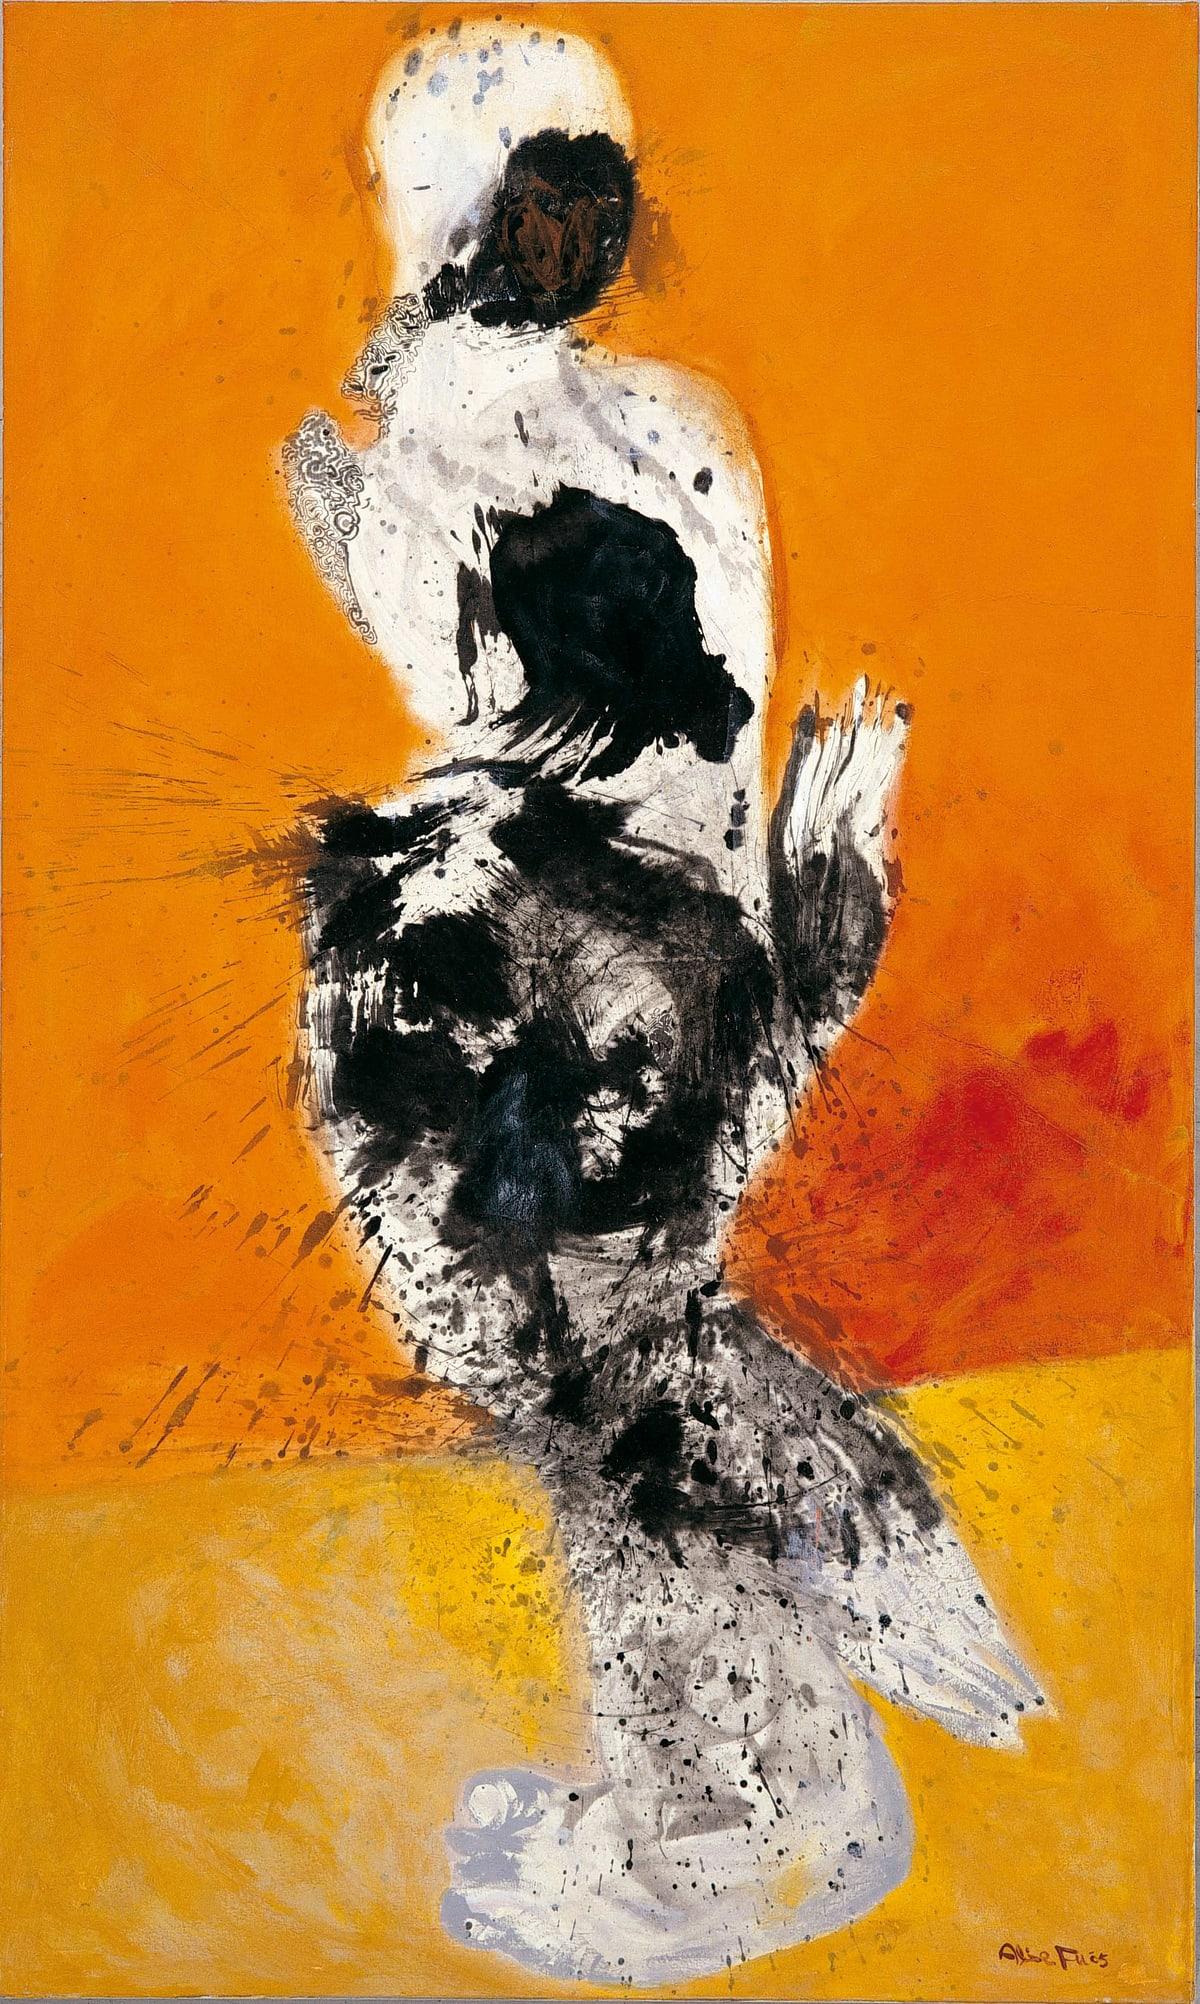 Alixe Fu, Dancing, 2005